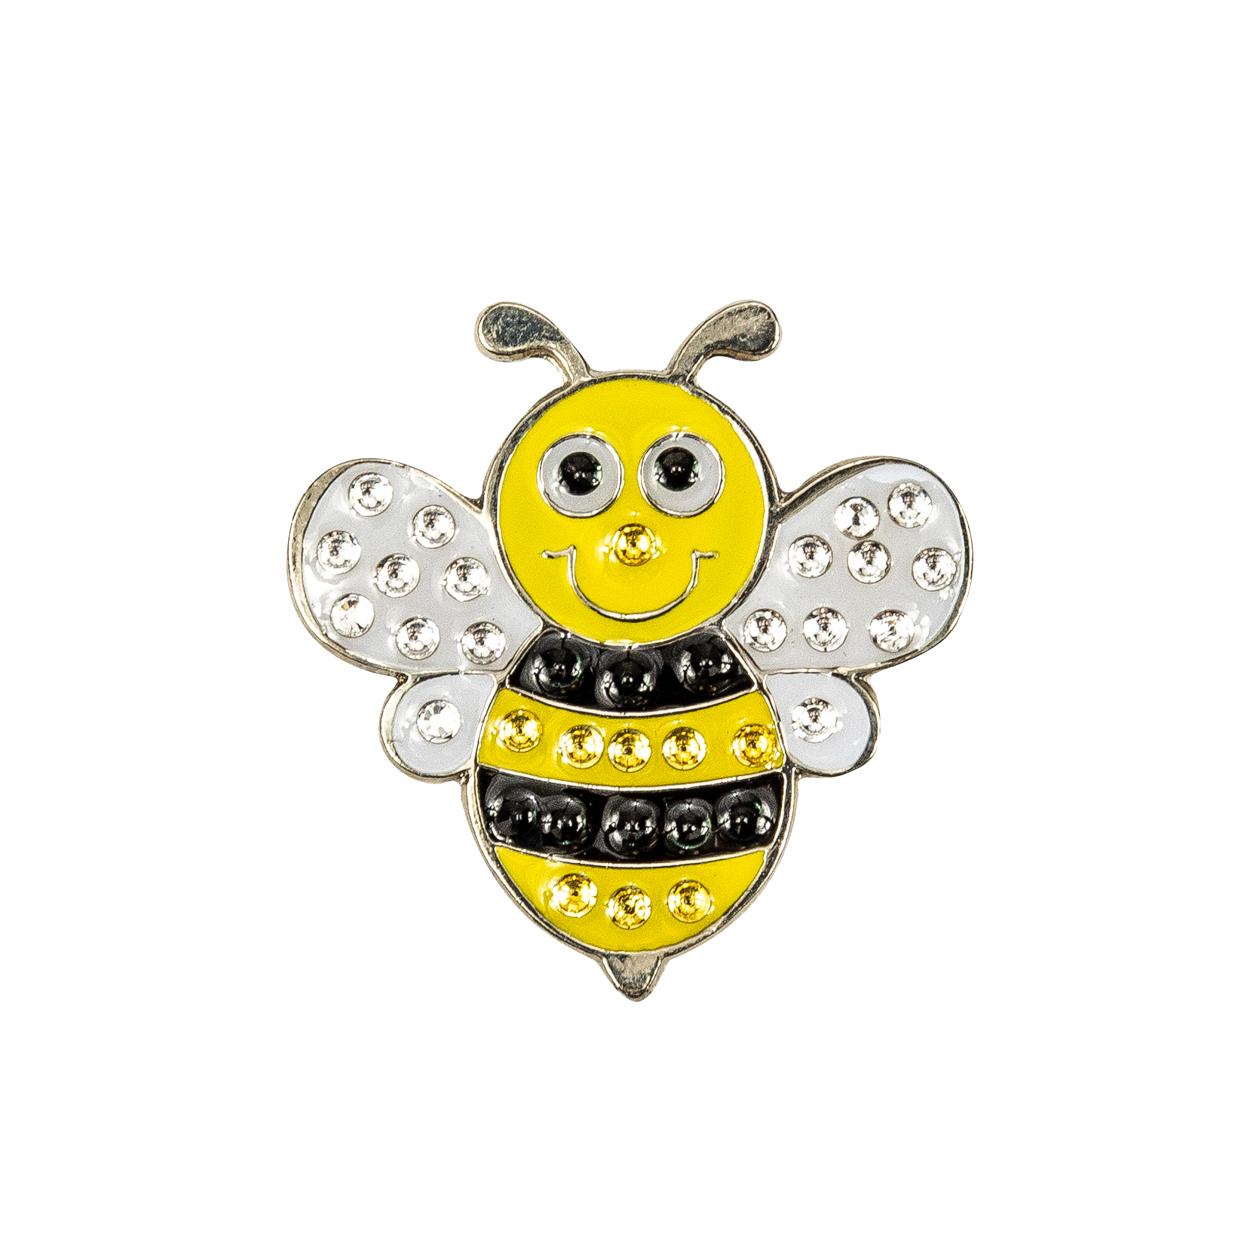 105. Bumble Bee